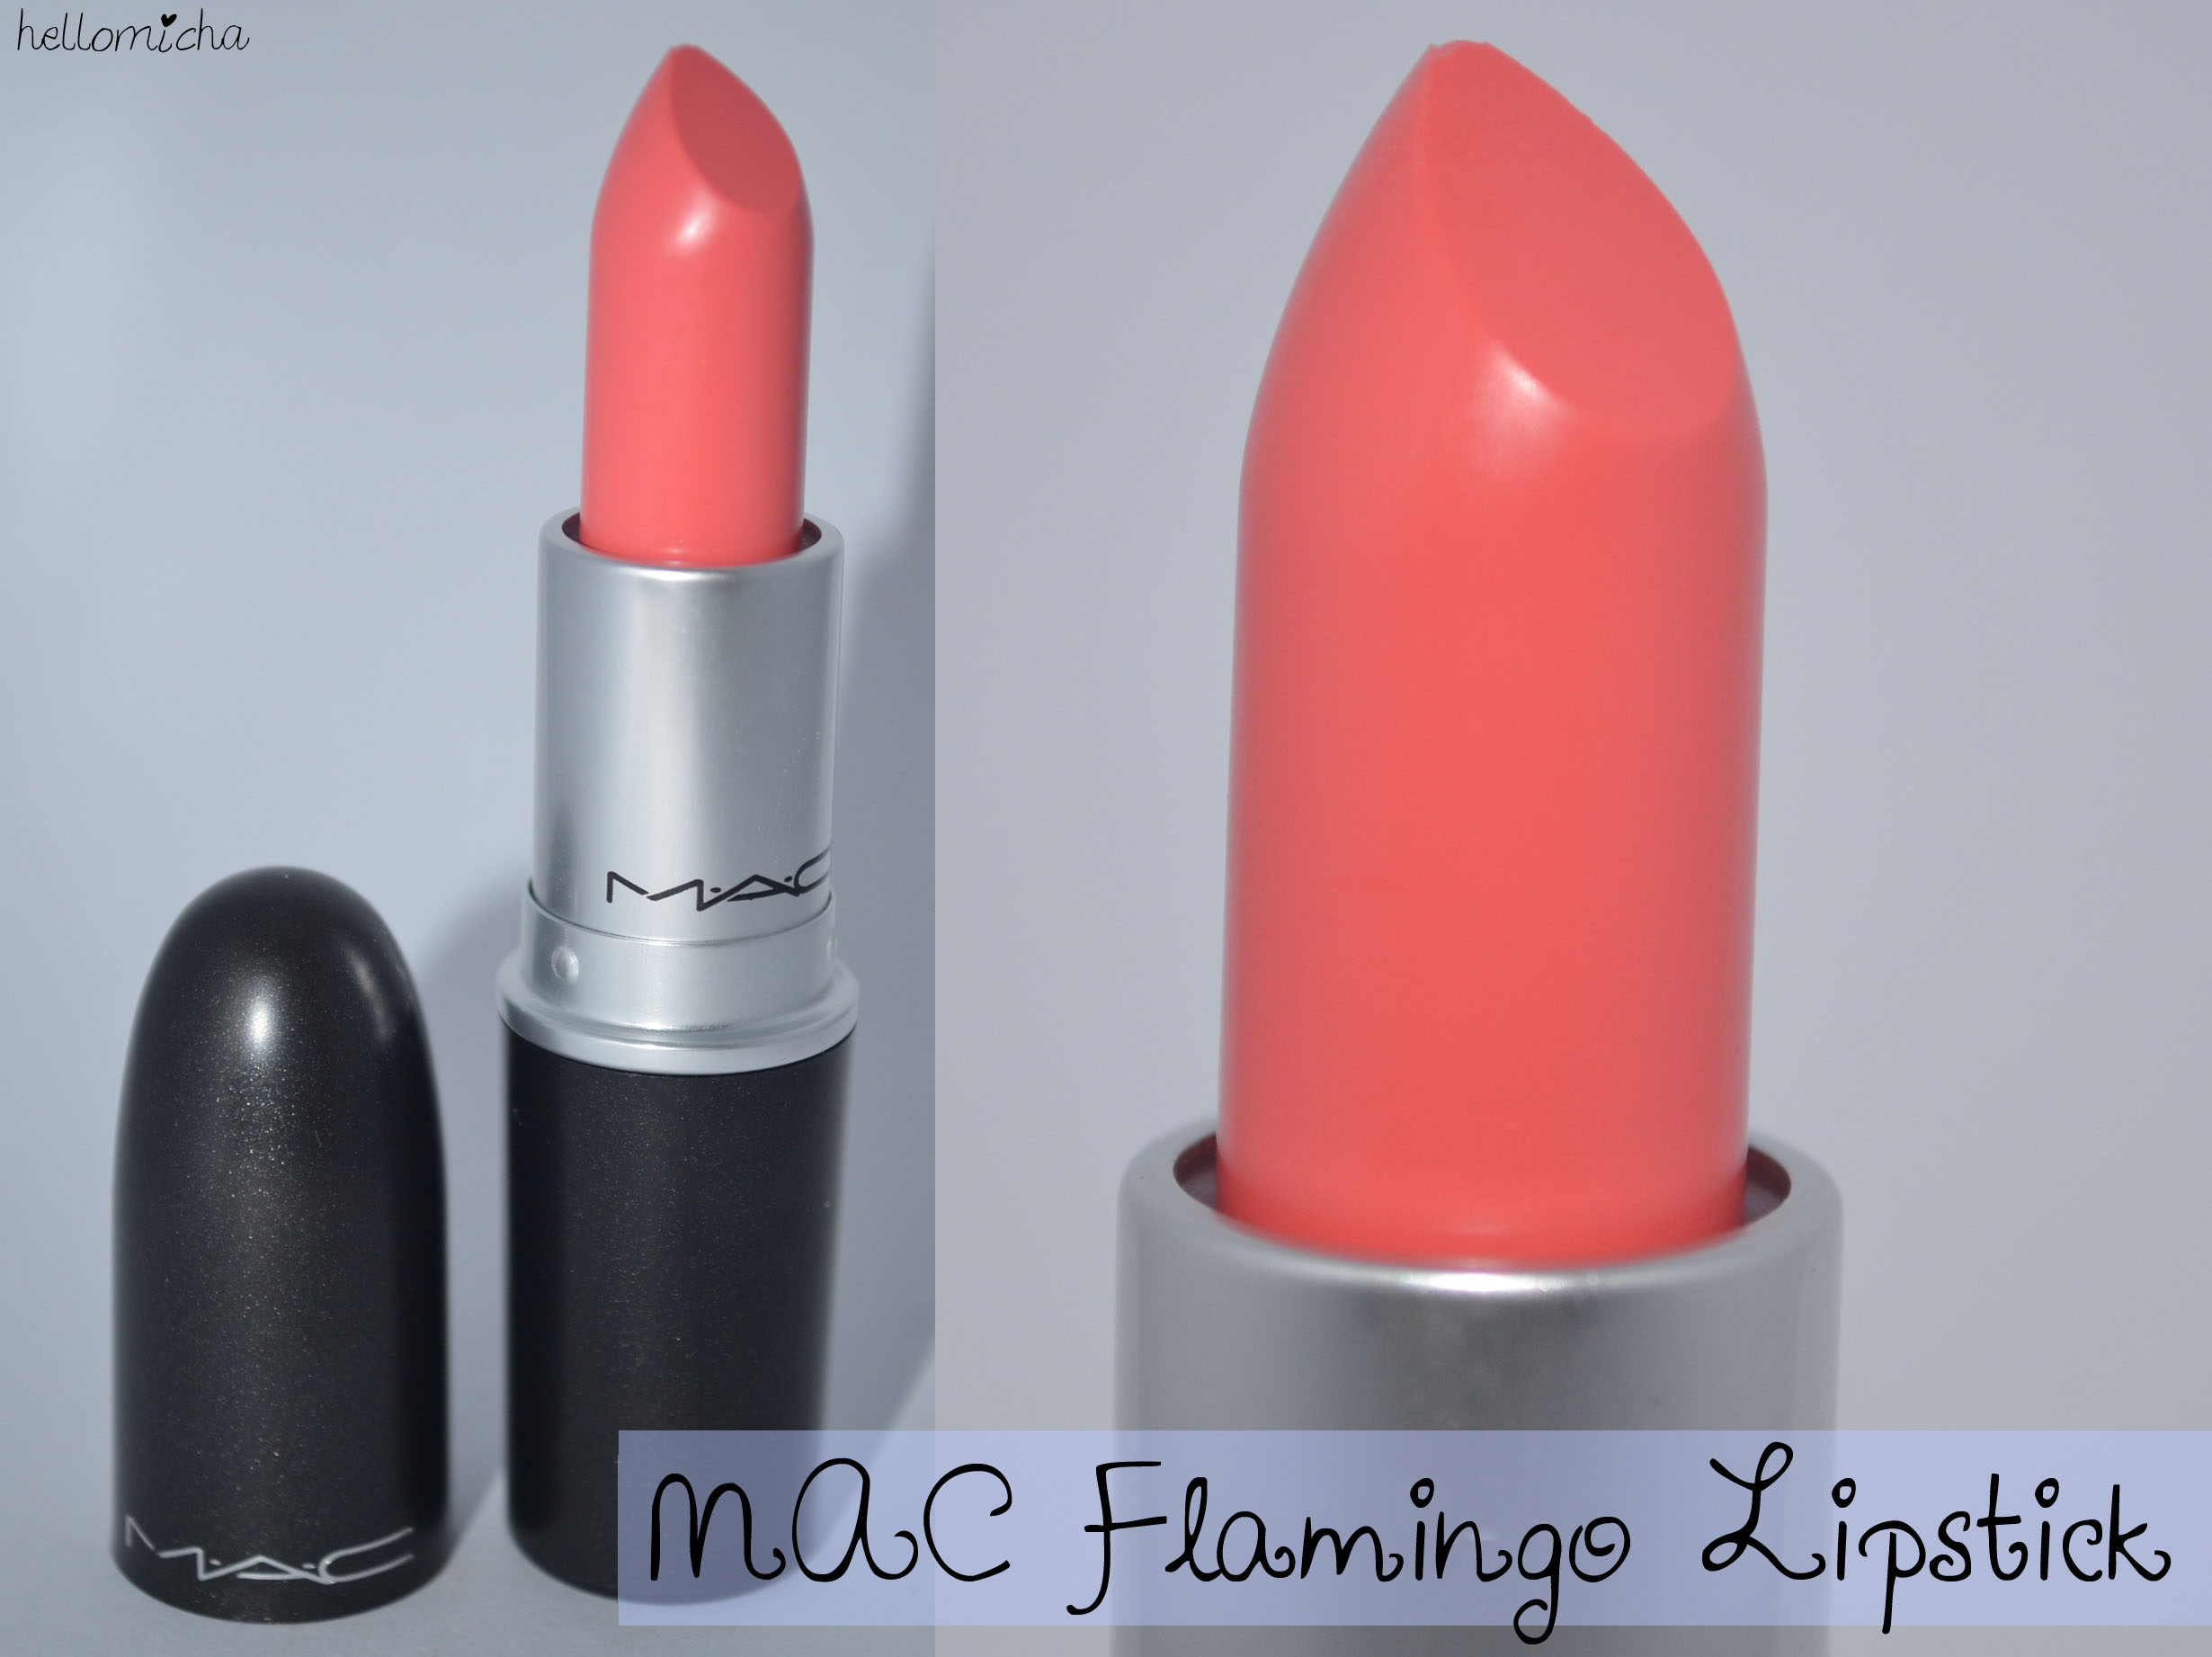 Mac Flamingo Lipstick Review Hello Micha